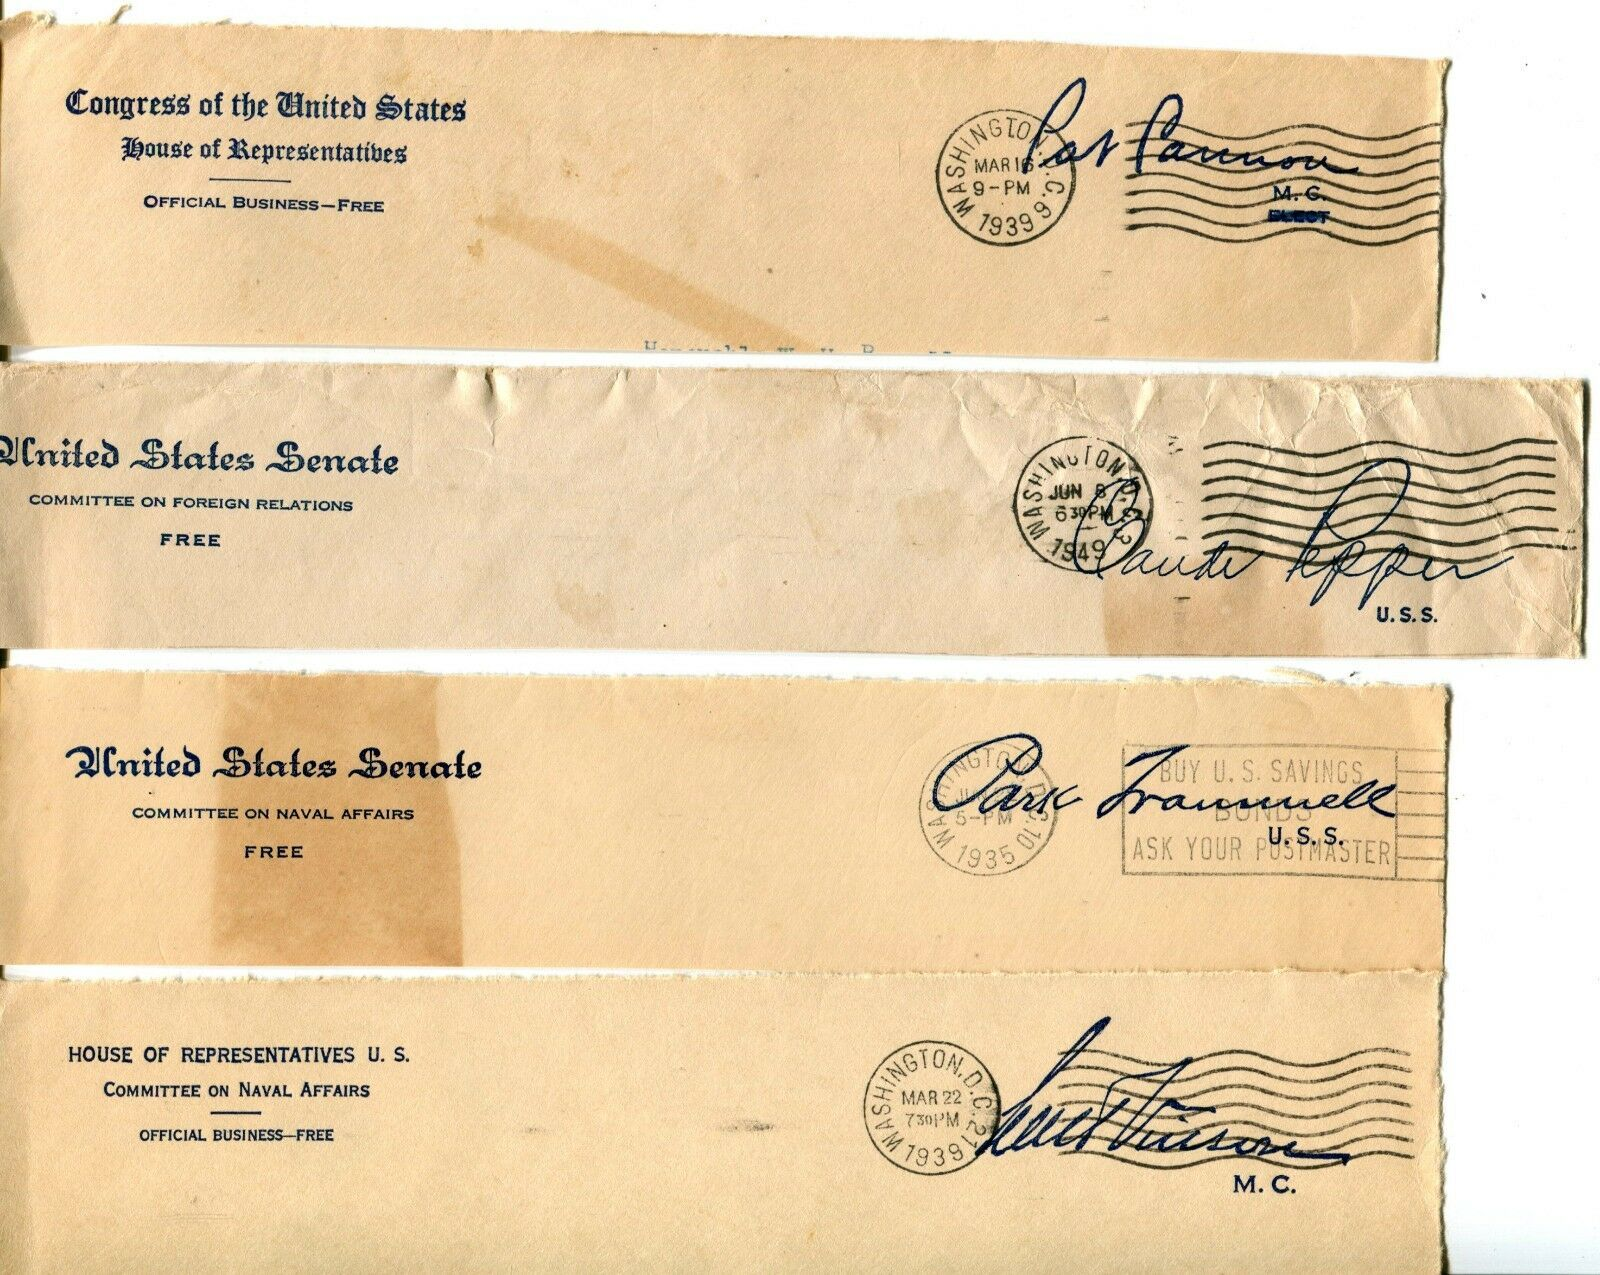 USA Senate House of Representatives Free Postage Cover Envelope Cuts Washington image 3